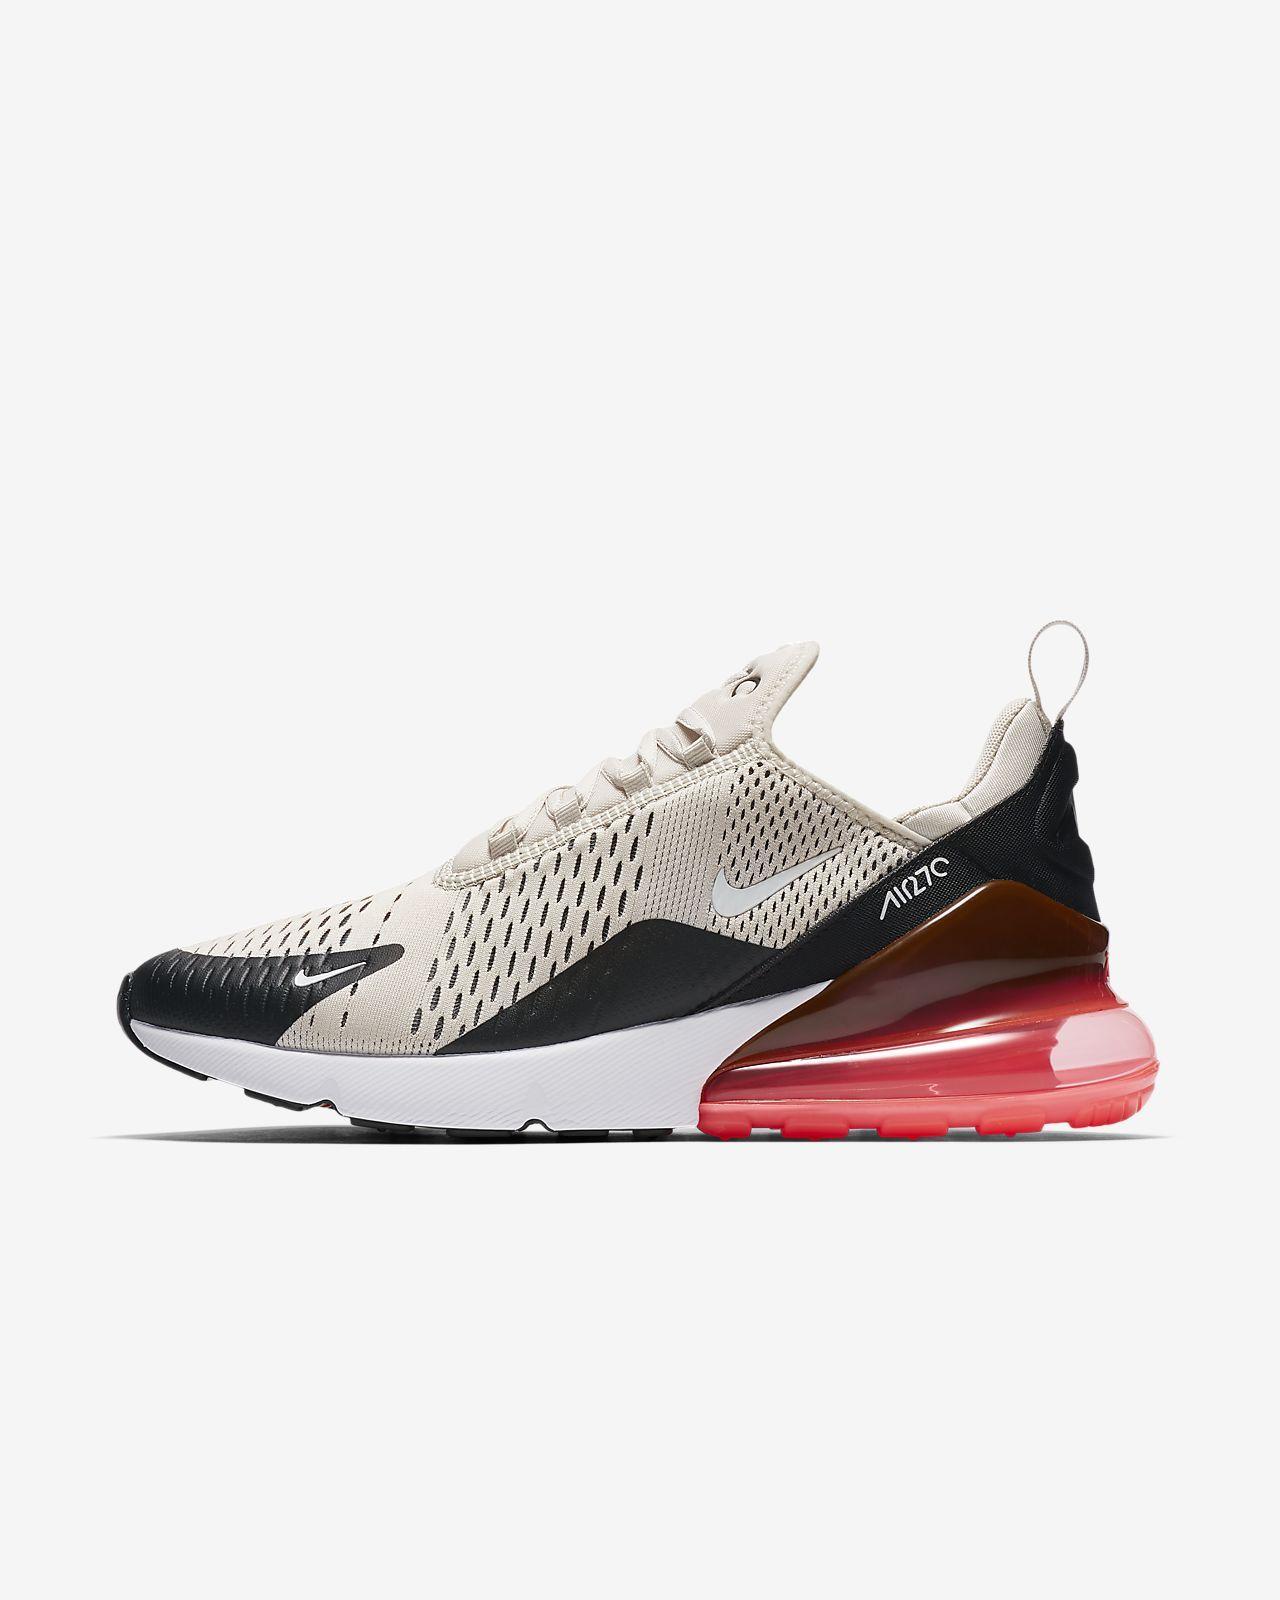 brand new e7eae 7d586 Nike Air Max 270 Men s Shoe